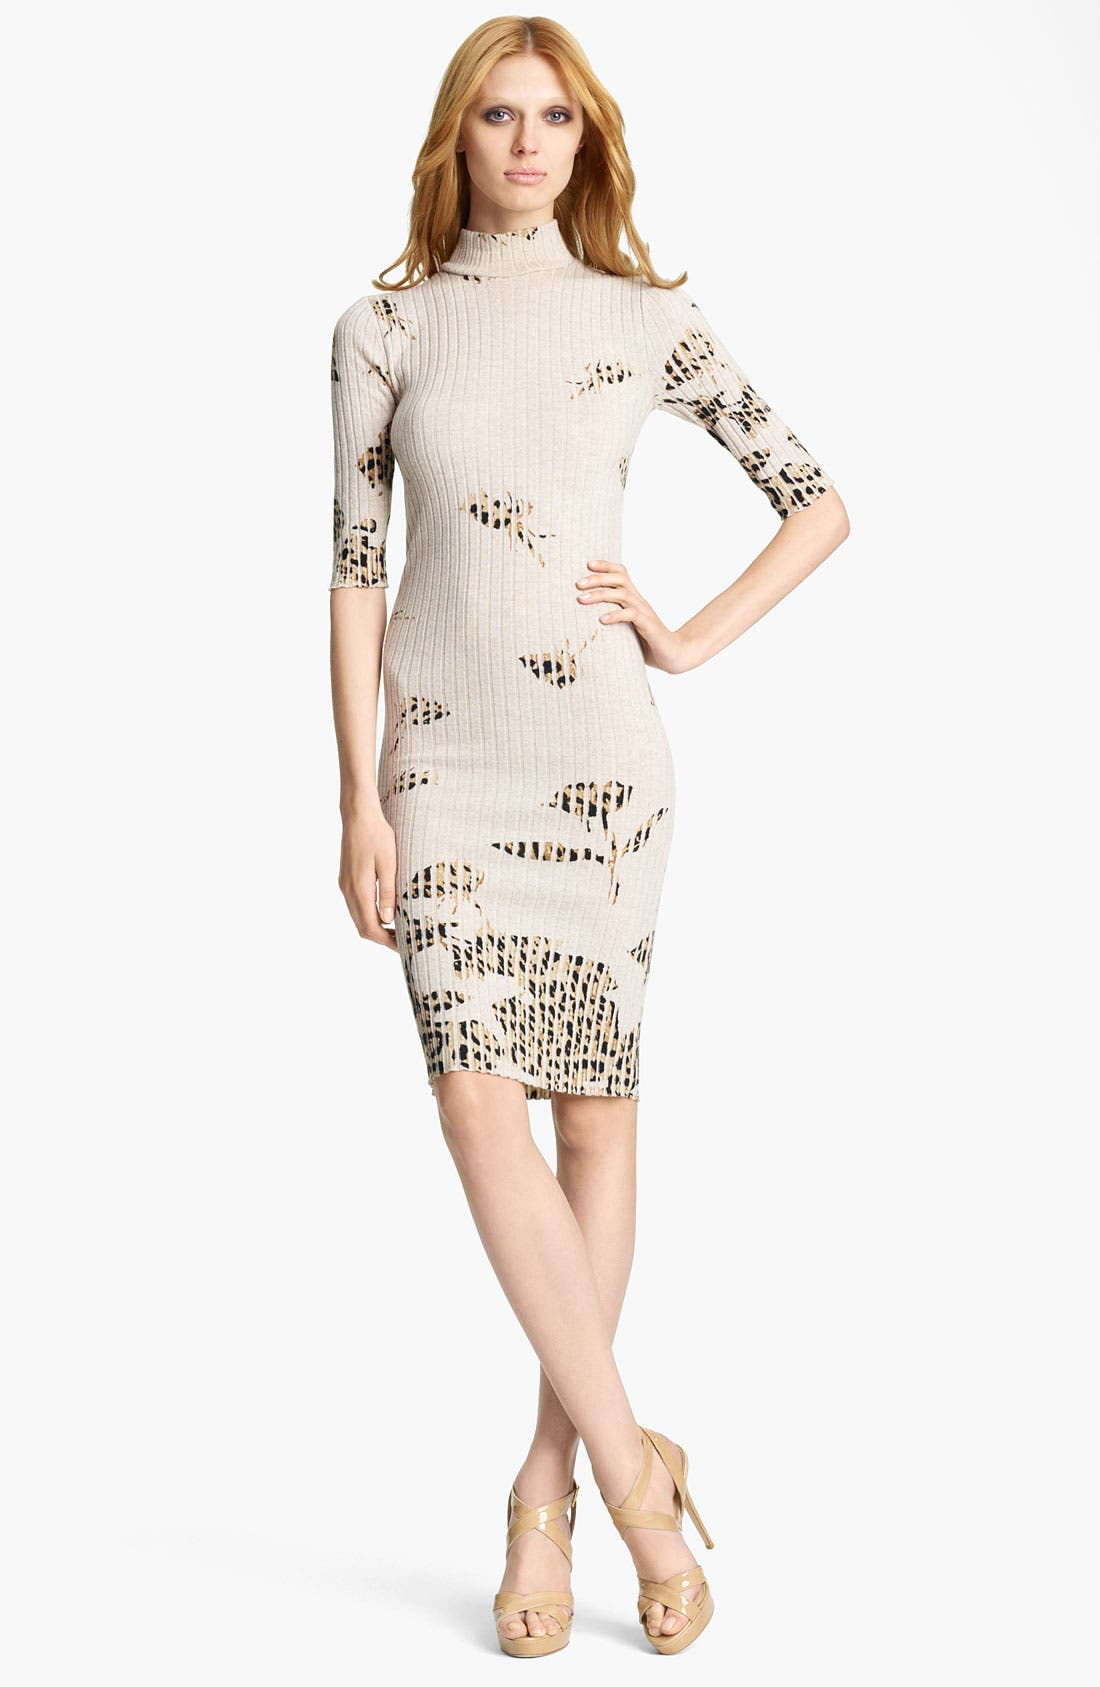 Alternate Image 1 Selected - Blumarine Rib Knit Dress